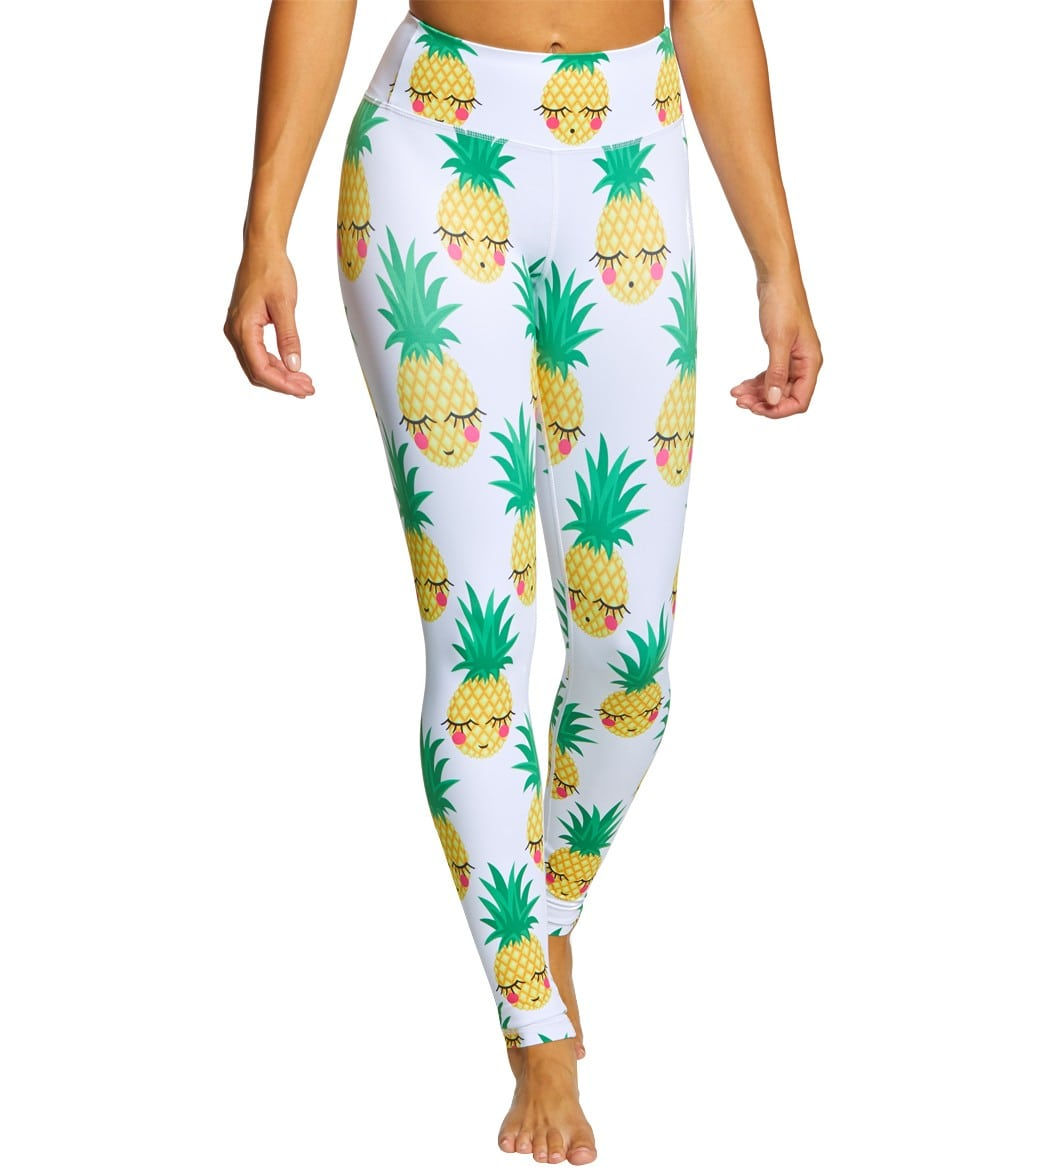 24145d085bfc5 Flexi Lexi Women s Pineapple Flexi Leggings at SwimOutlet.com - Free  Shipping